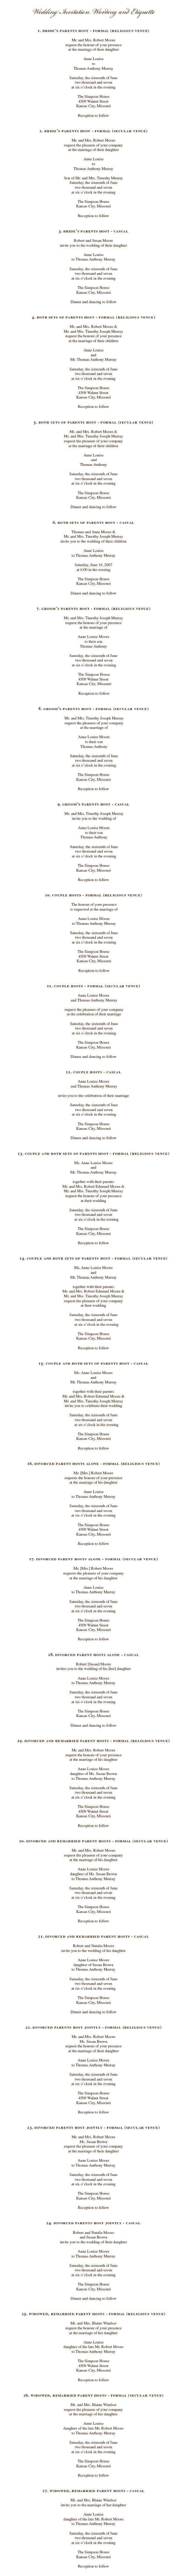 Wedding Invitation Wording And Etiquette Invitations Pinterest